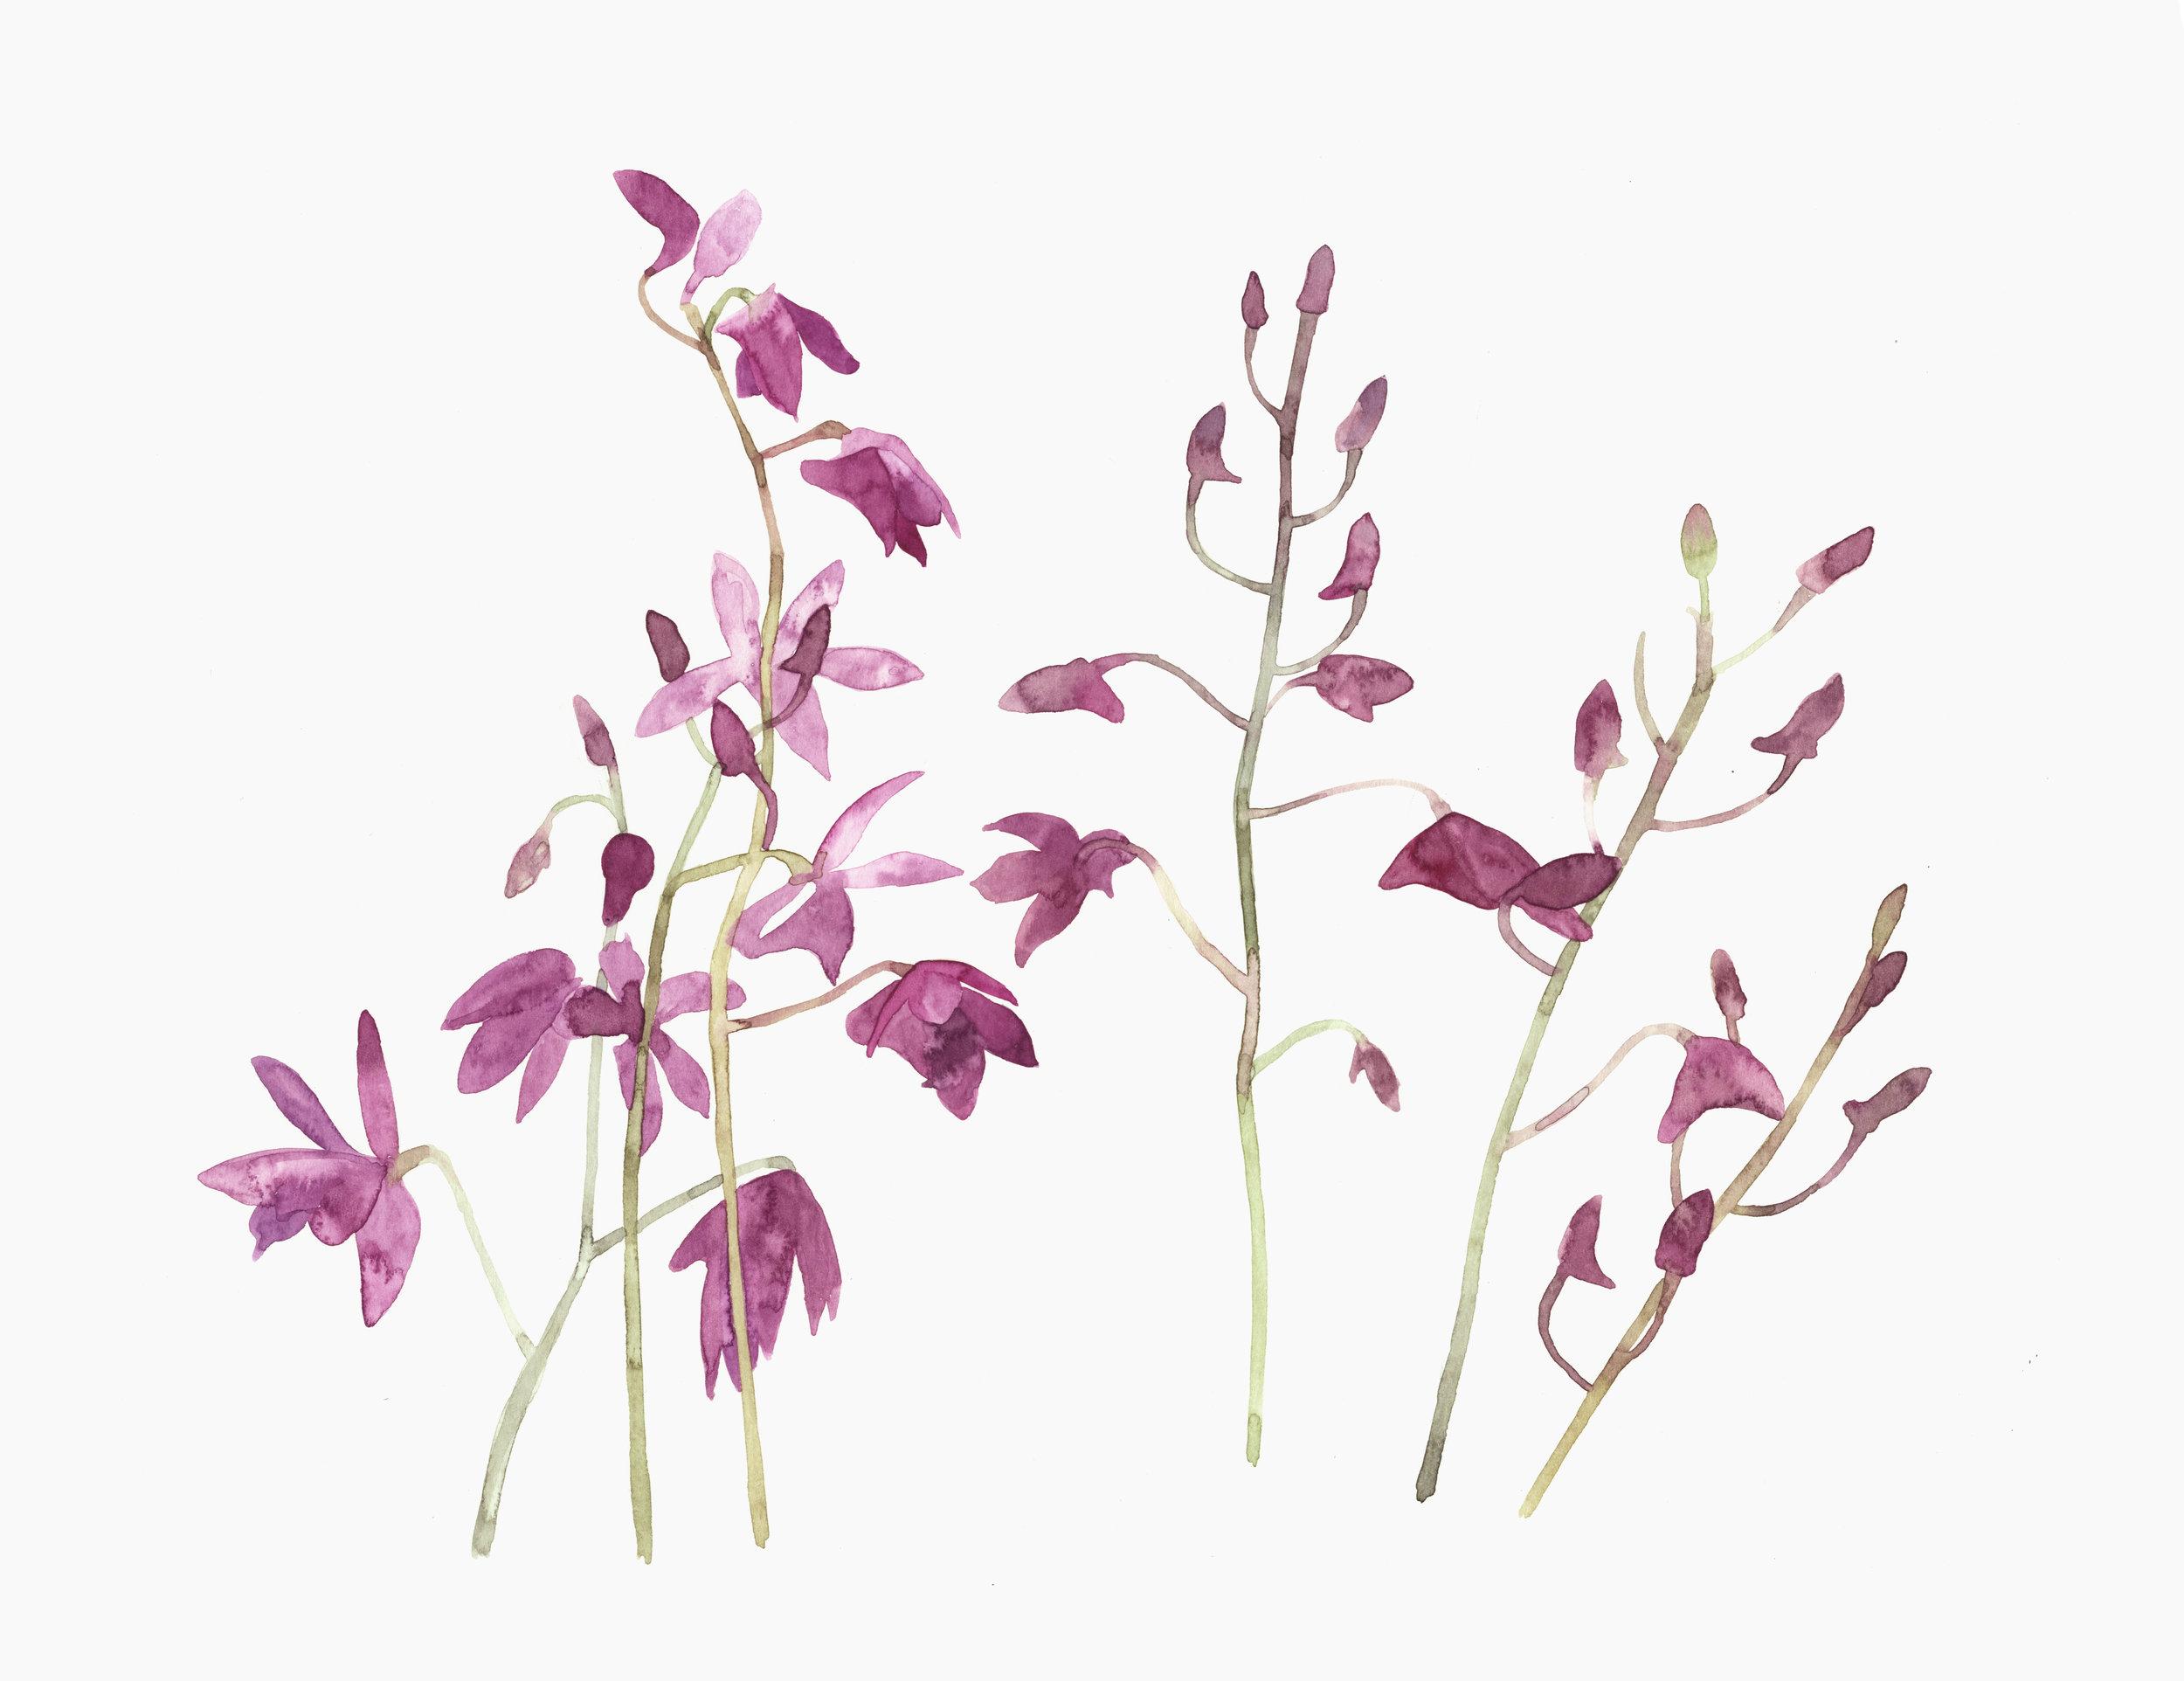 Fuchsia Flower  watercolour  50 x 40 cm framed  £320